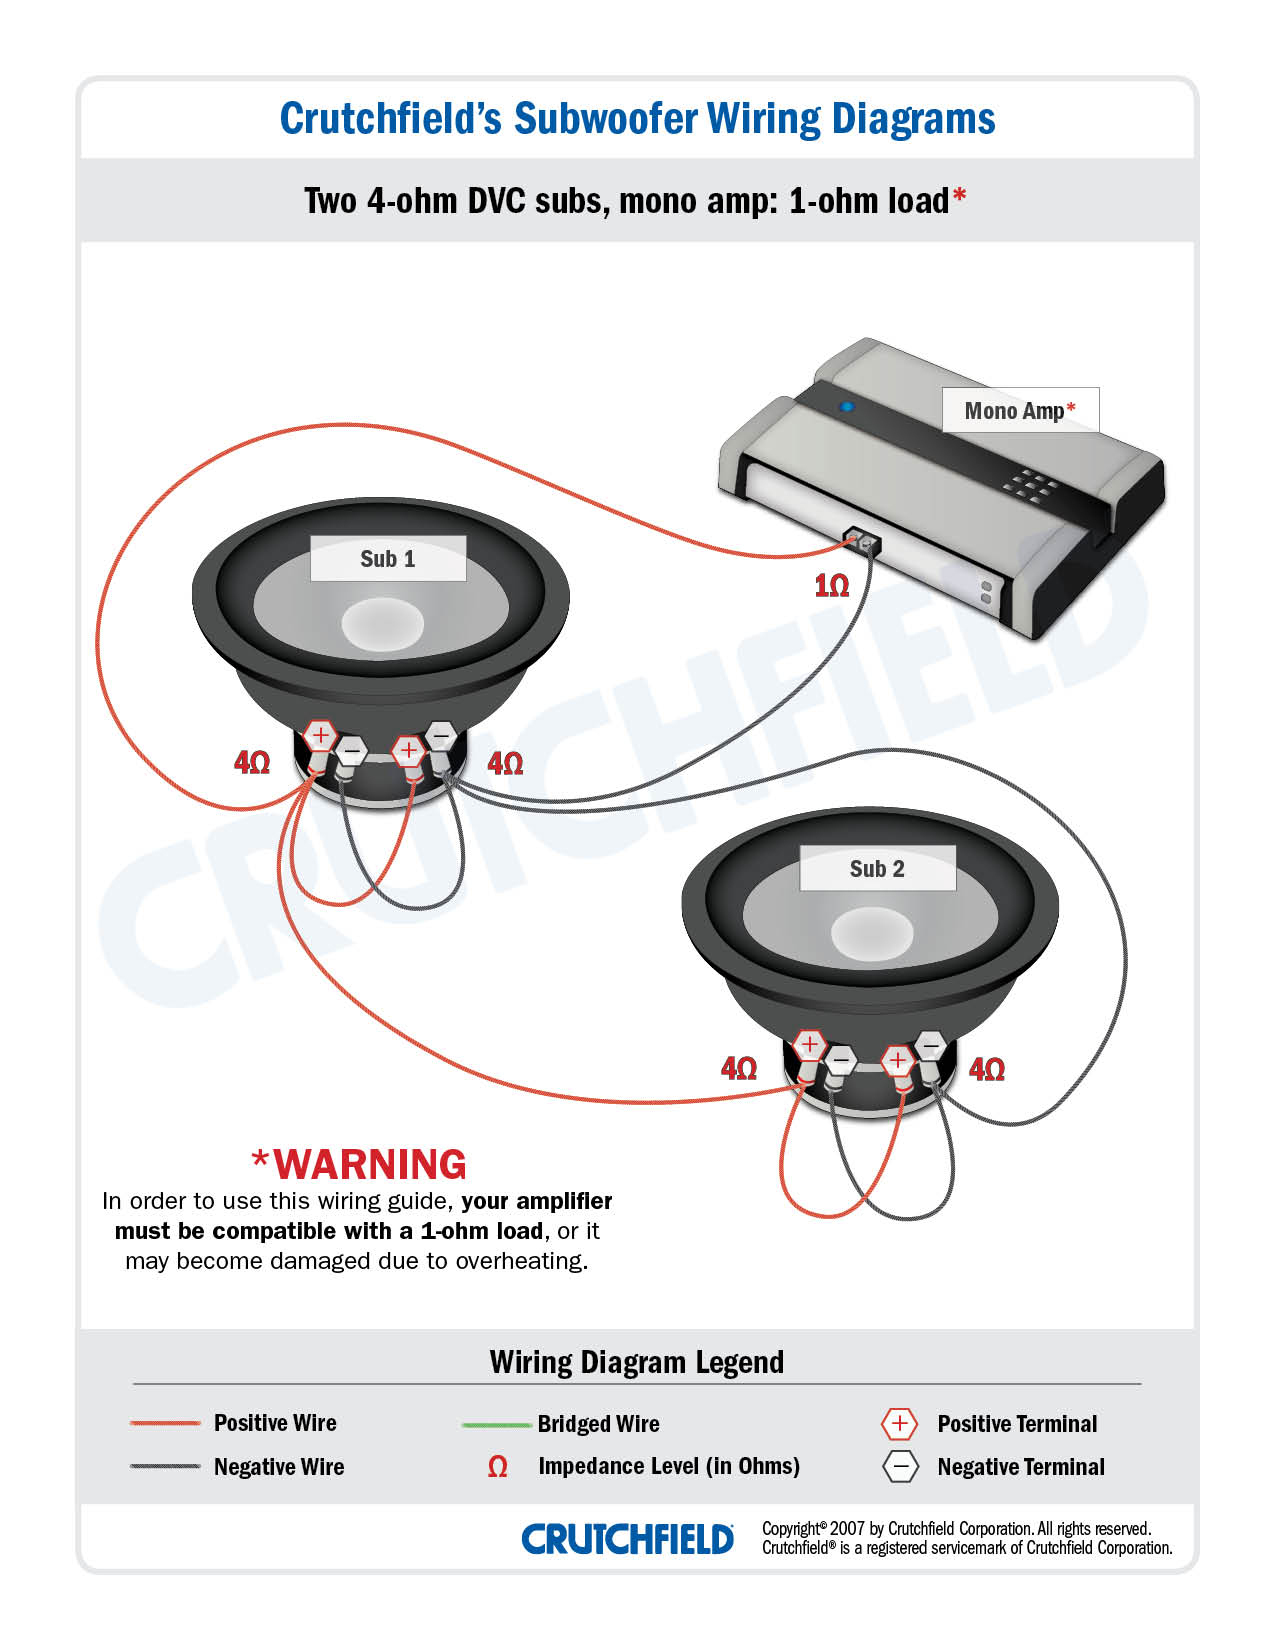 Rockford Fosgate P400 4 Wiring Diagram | Wiring Diagram - Rockford Fosgate Wiring Diagram